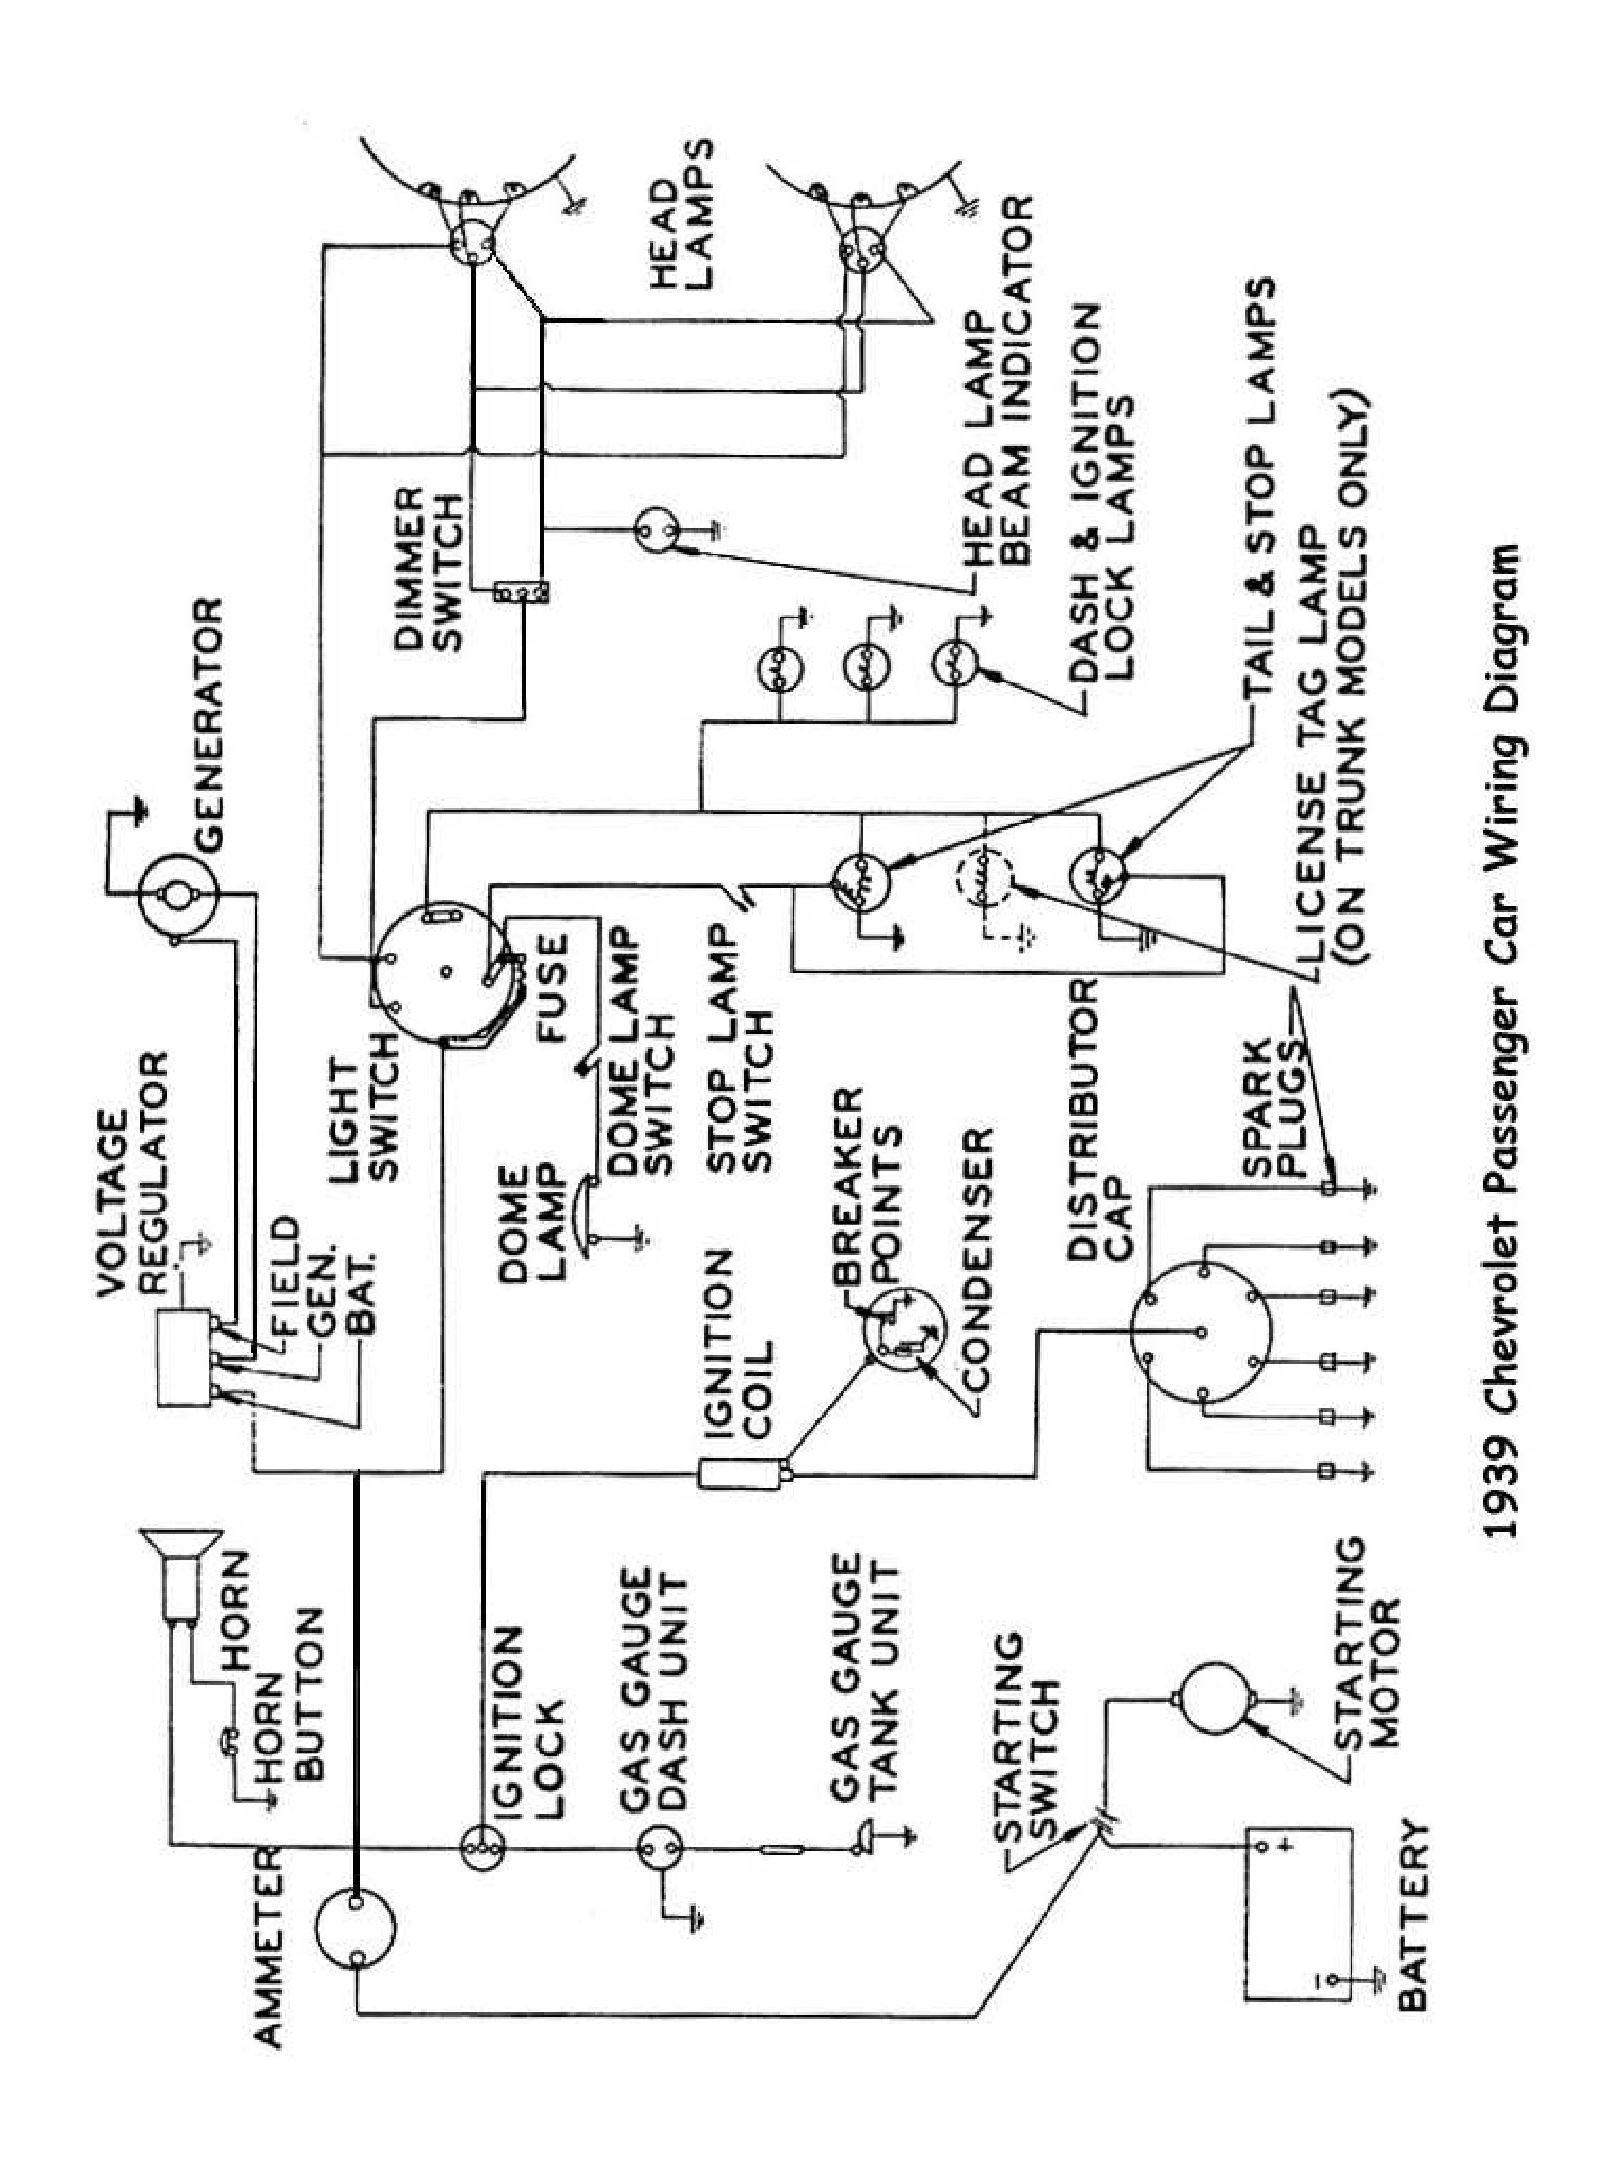 Chevy Bel Air Wiring Diagram